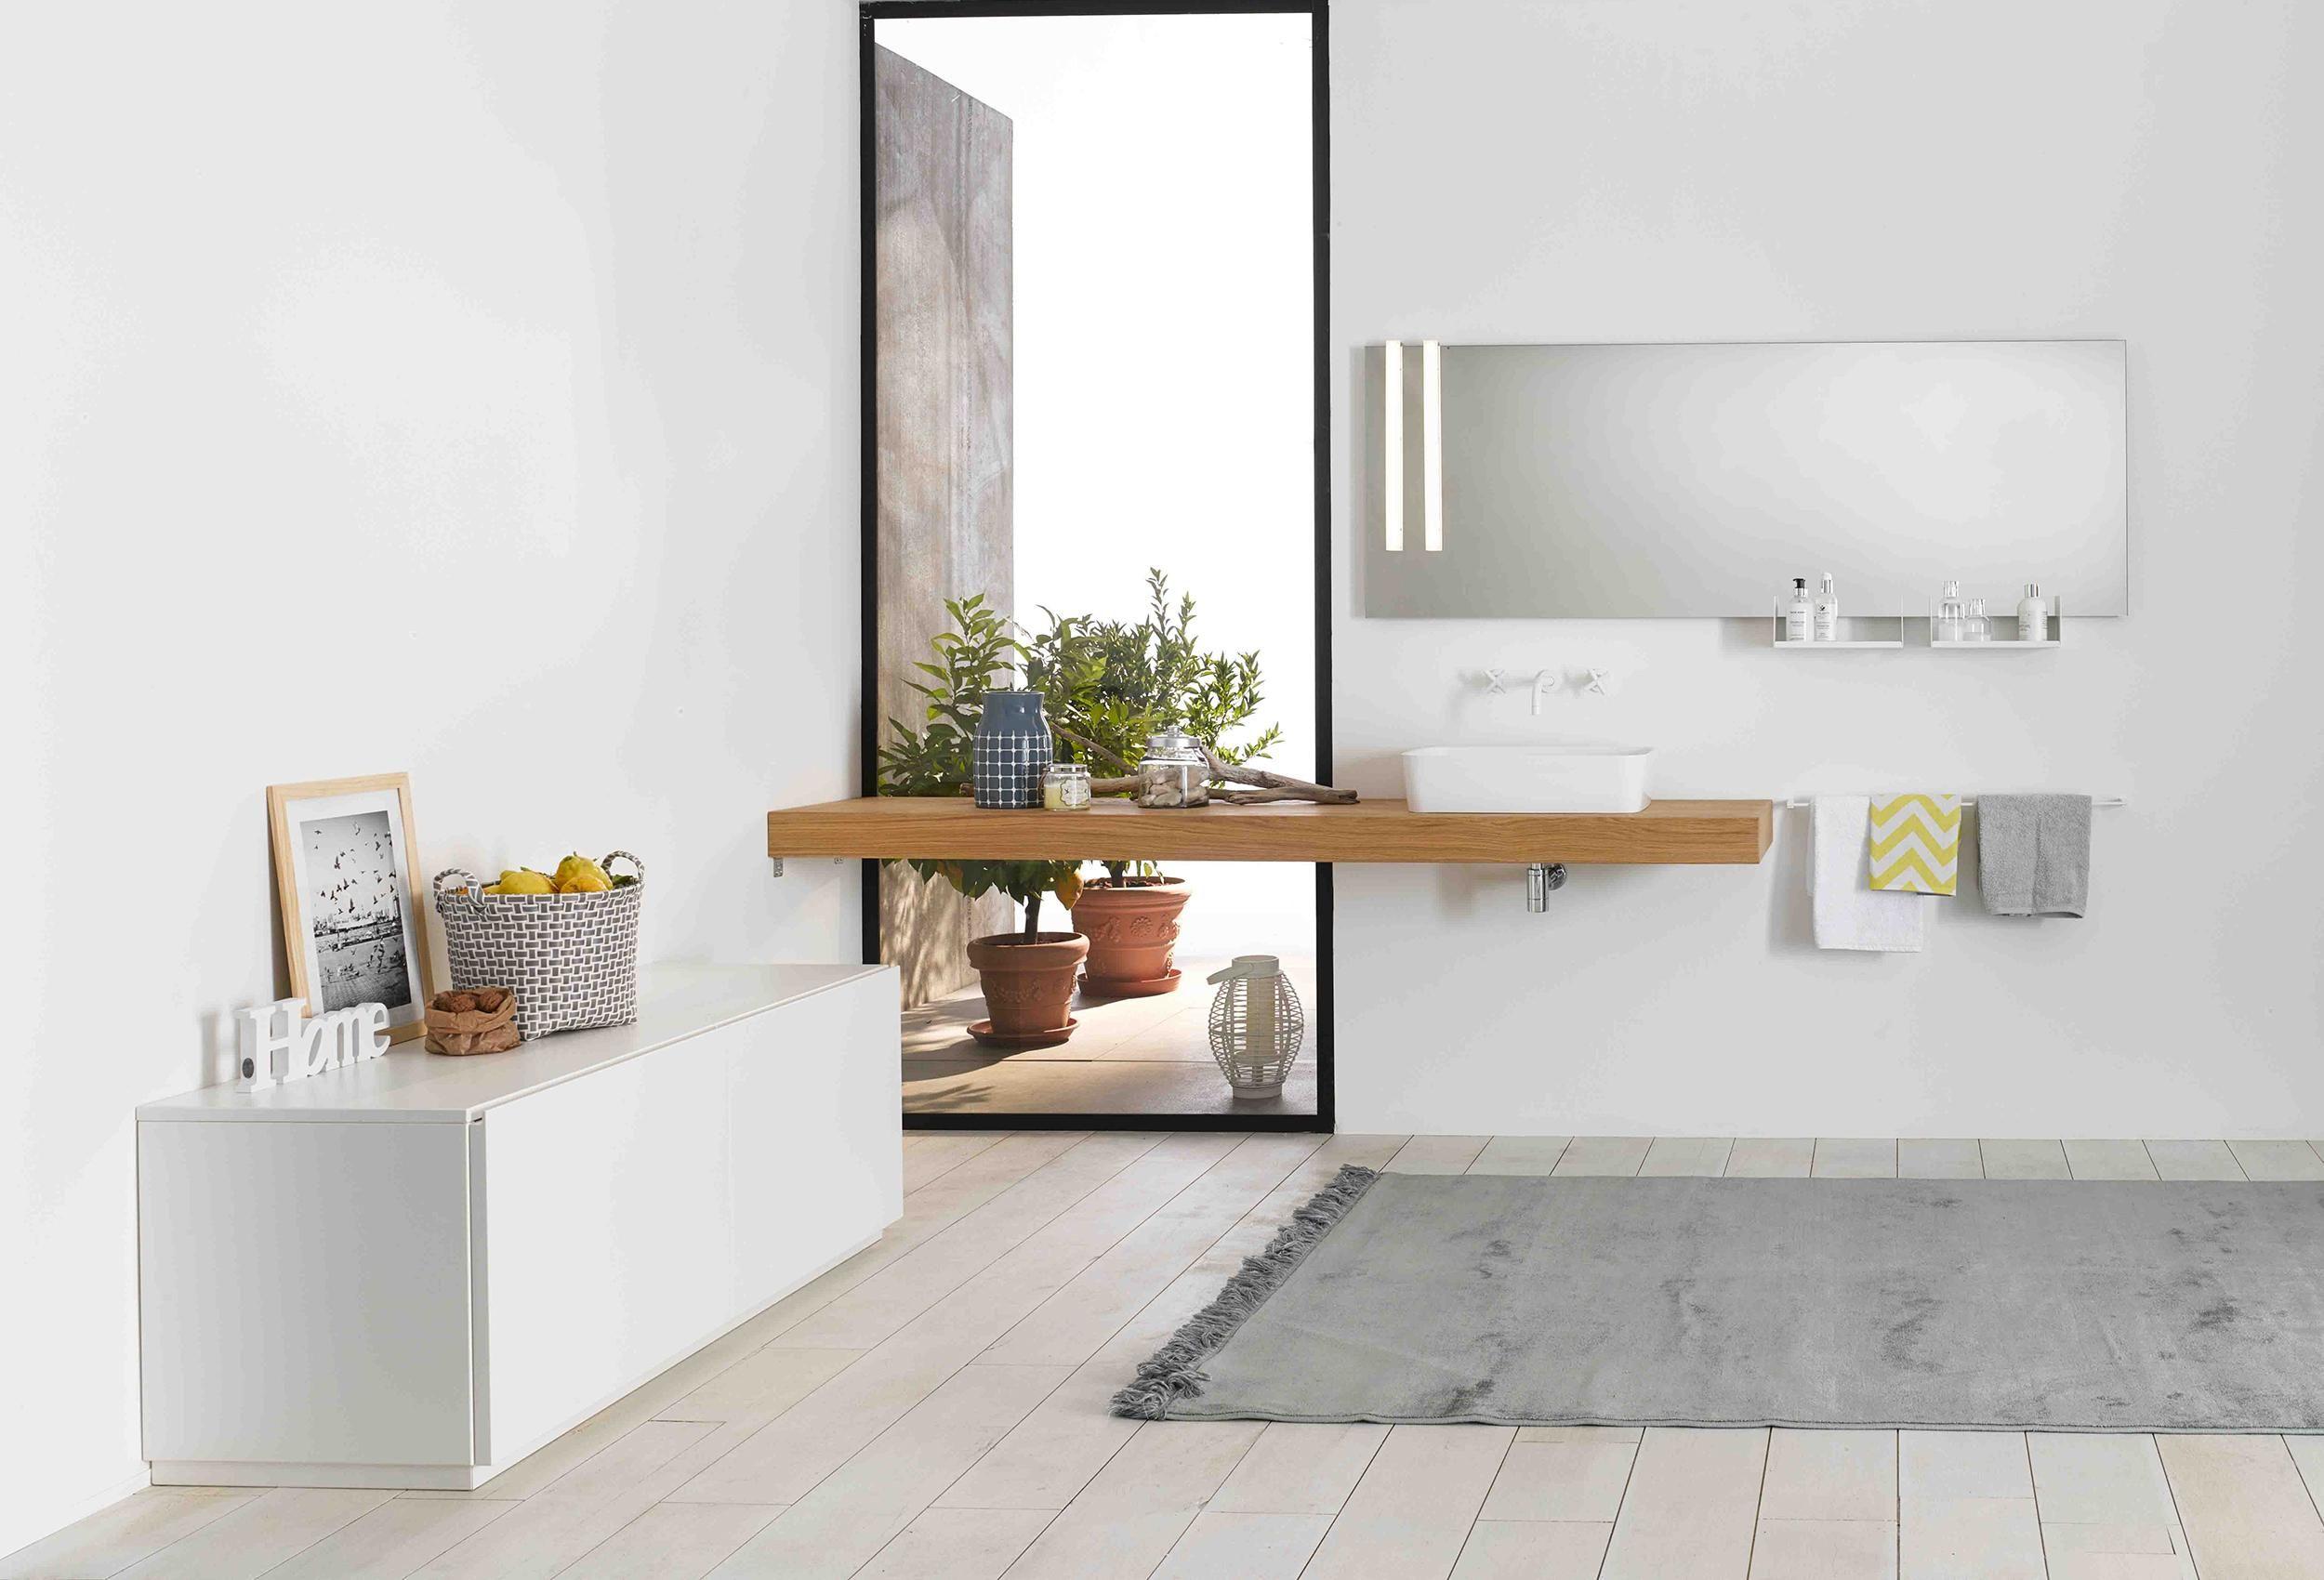 Stocco Arredobagno ~ Over tailormade stocco bath room bath room bath